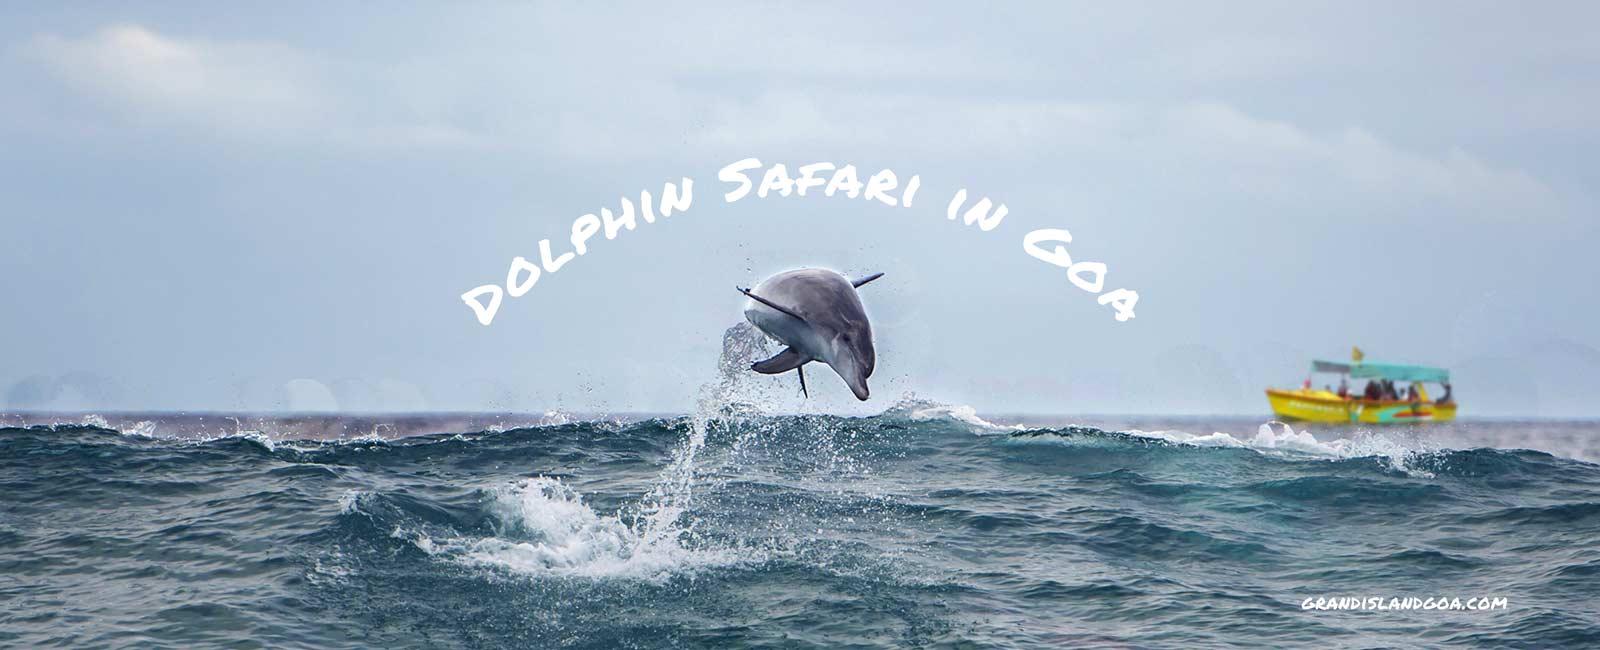 dolphin-safari-goa